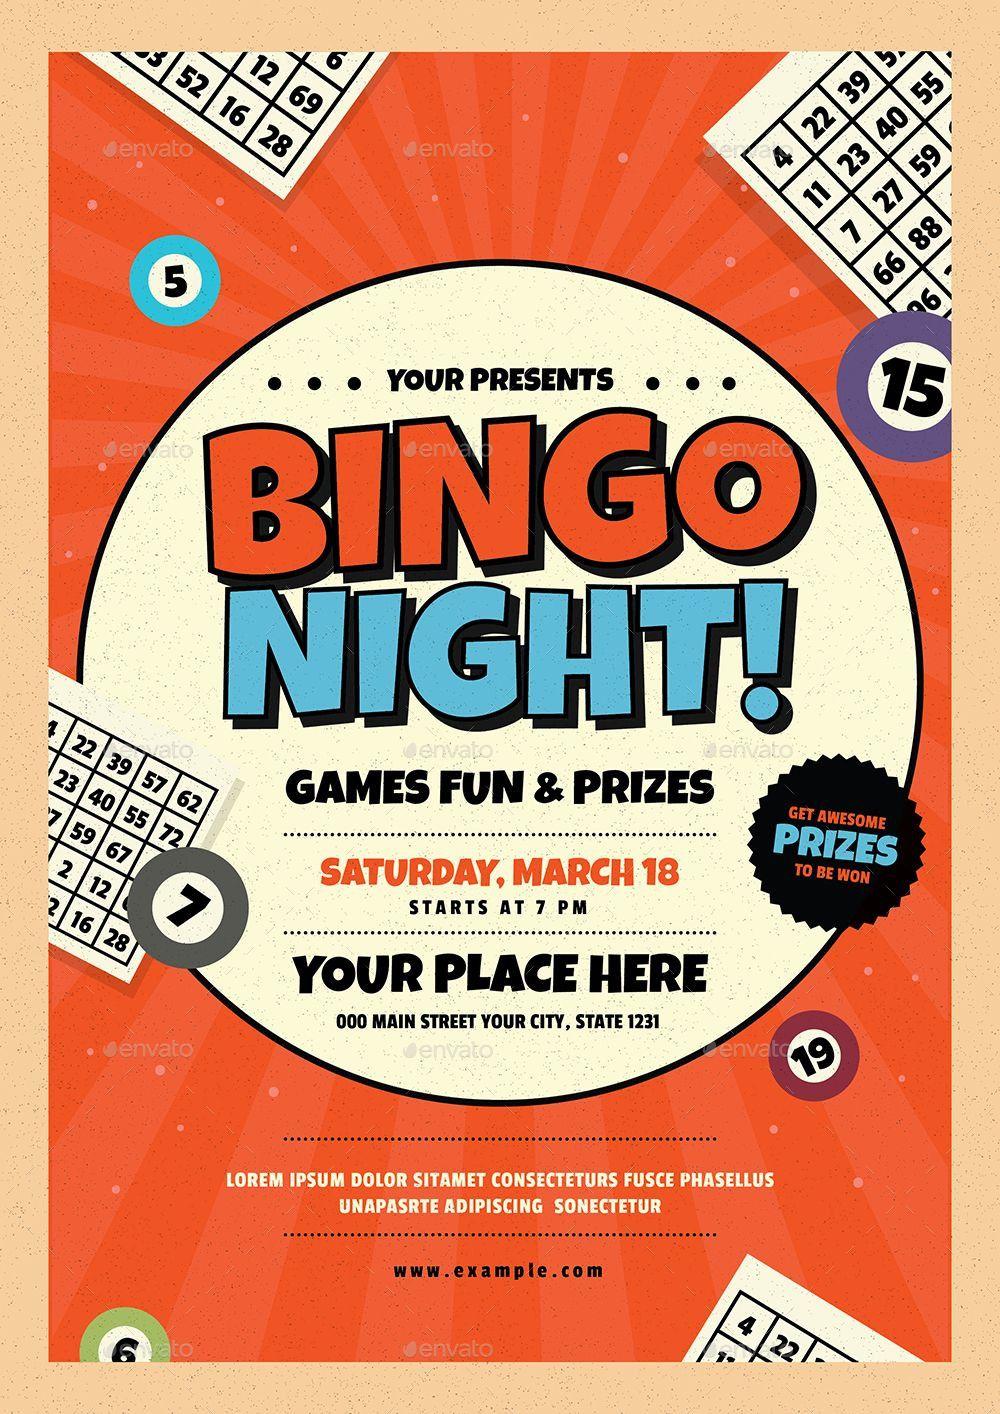 Game Night Date Night Game night decorations, Game night